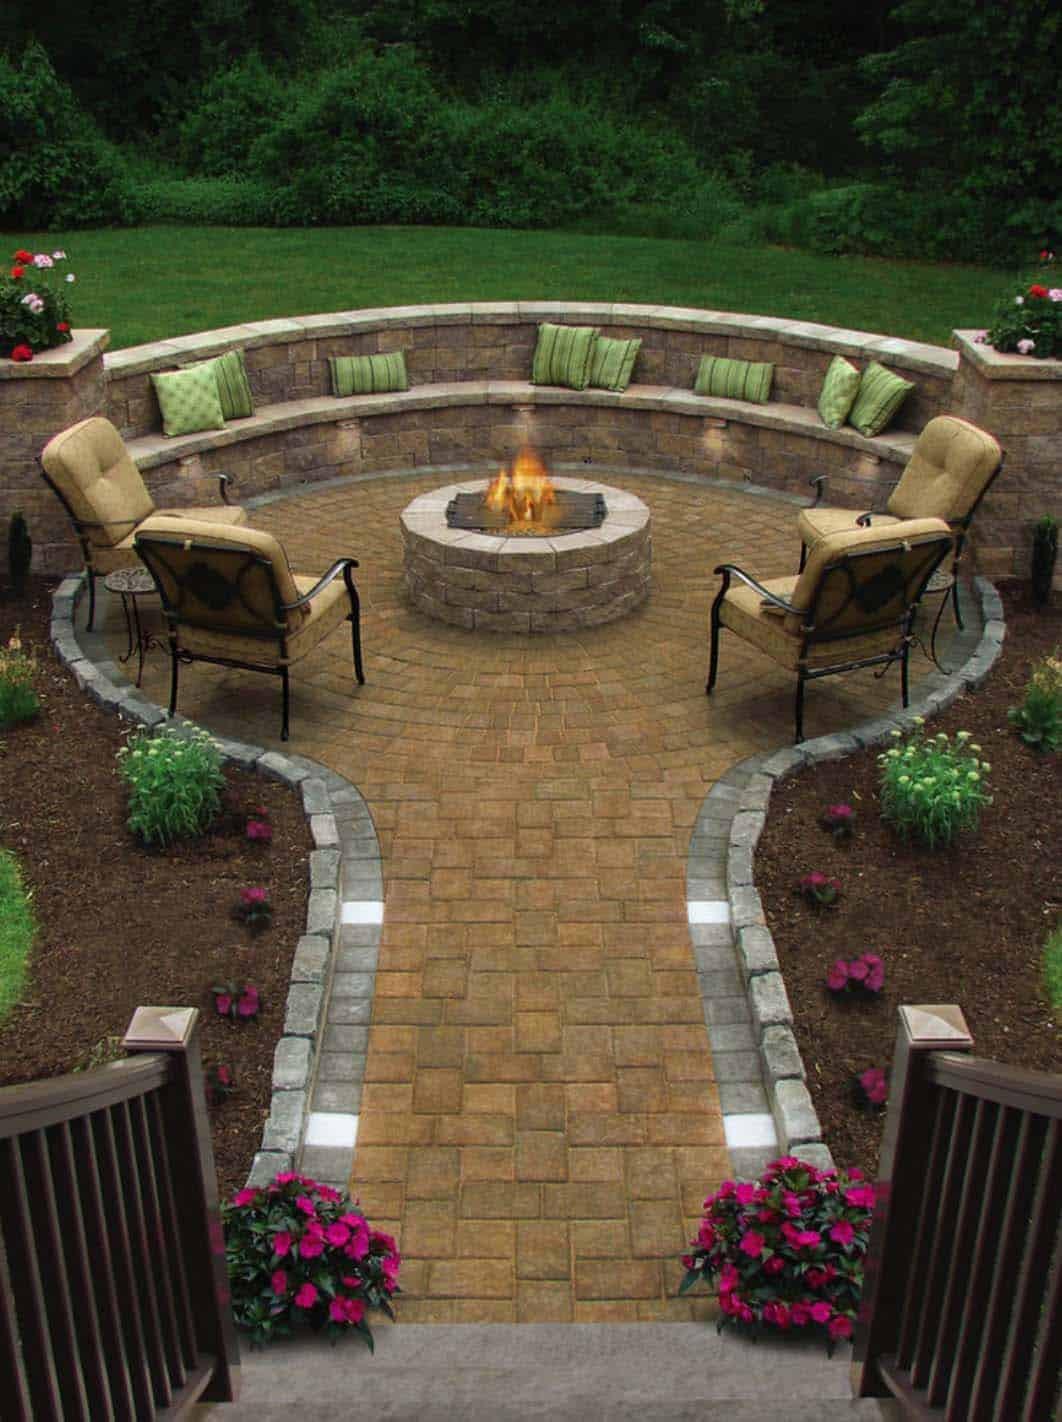 Built In Firepit  28 Inspiring Fire Pit Ideas To Create A Fabulous Backyard